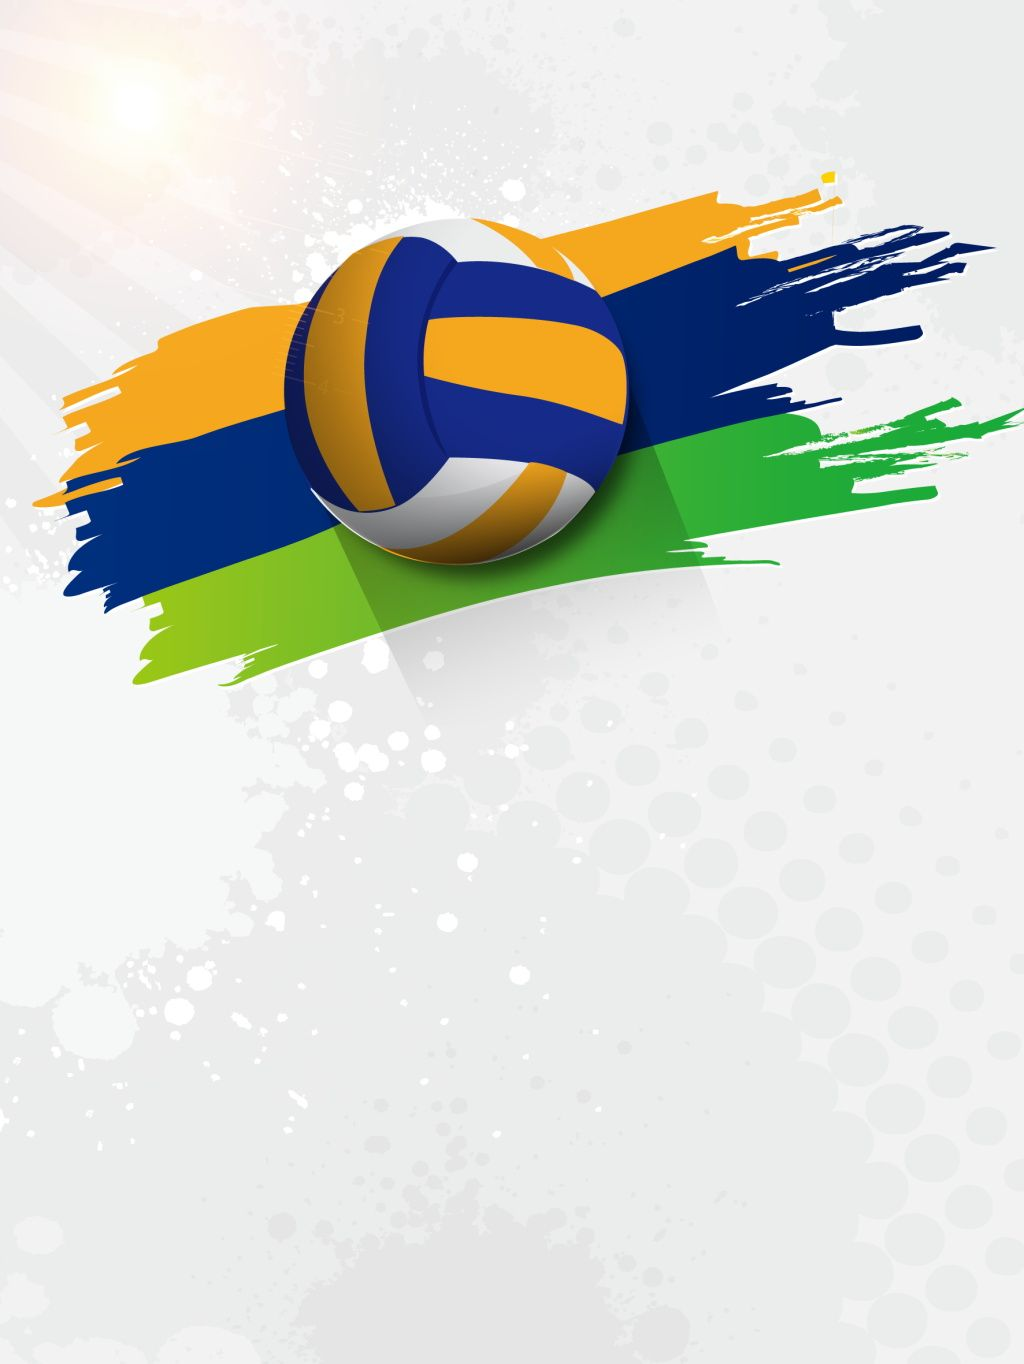 Kelab Bola Tampar Kampus Merekrut Latar Belakang Pengiklanan Baru In 2020 Volleyball Clubs Volleyball Posters Volleyball